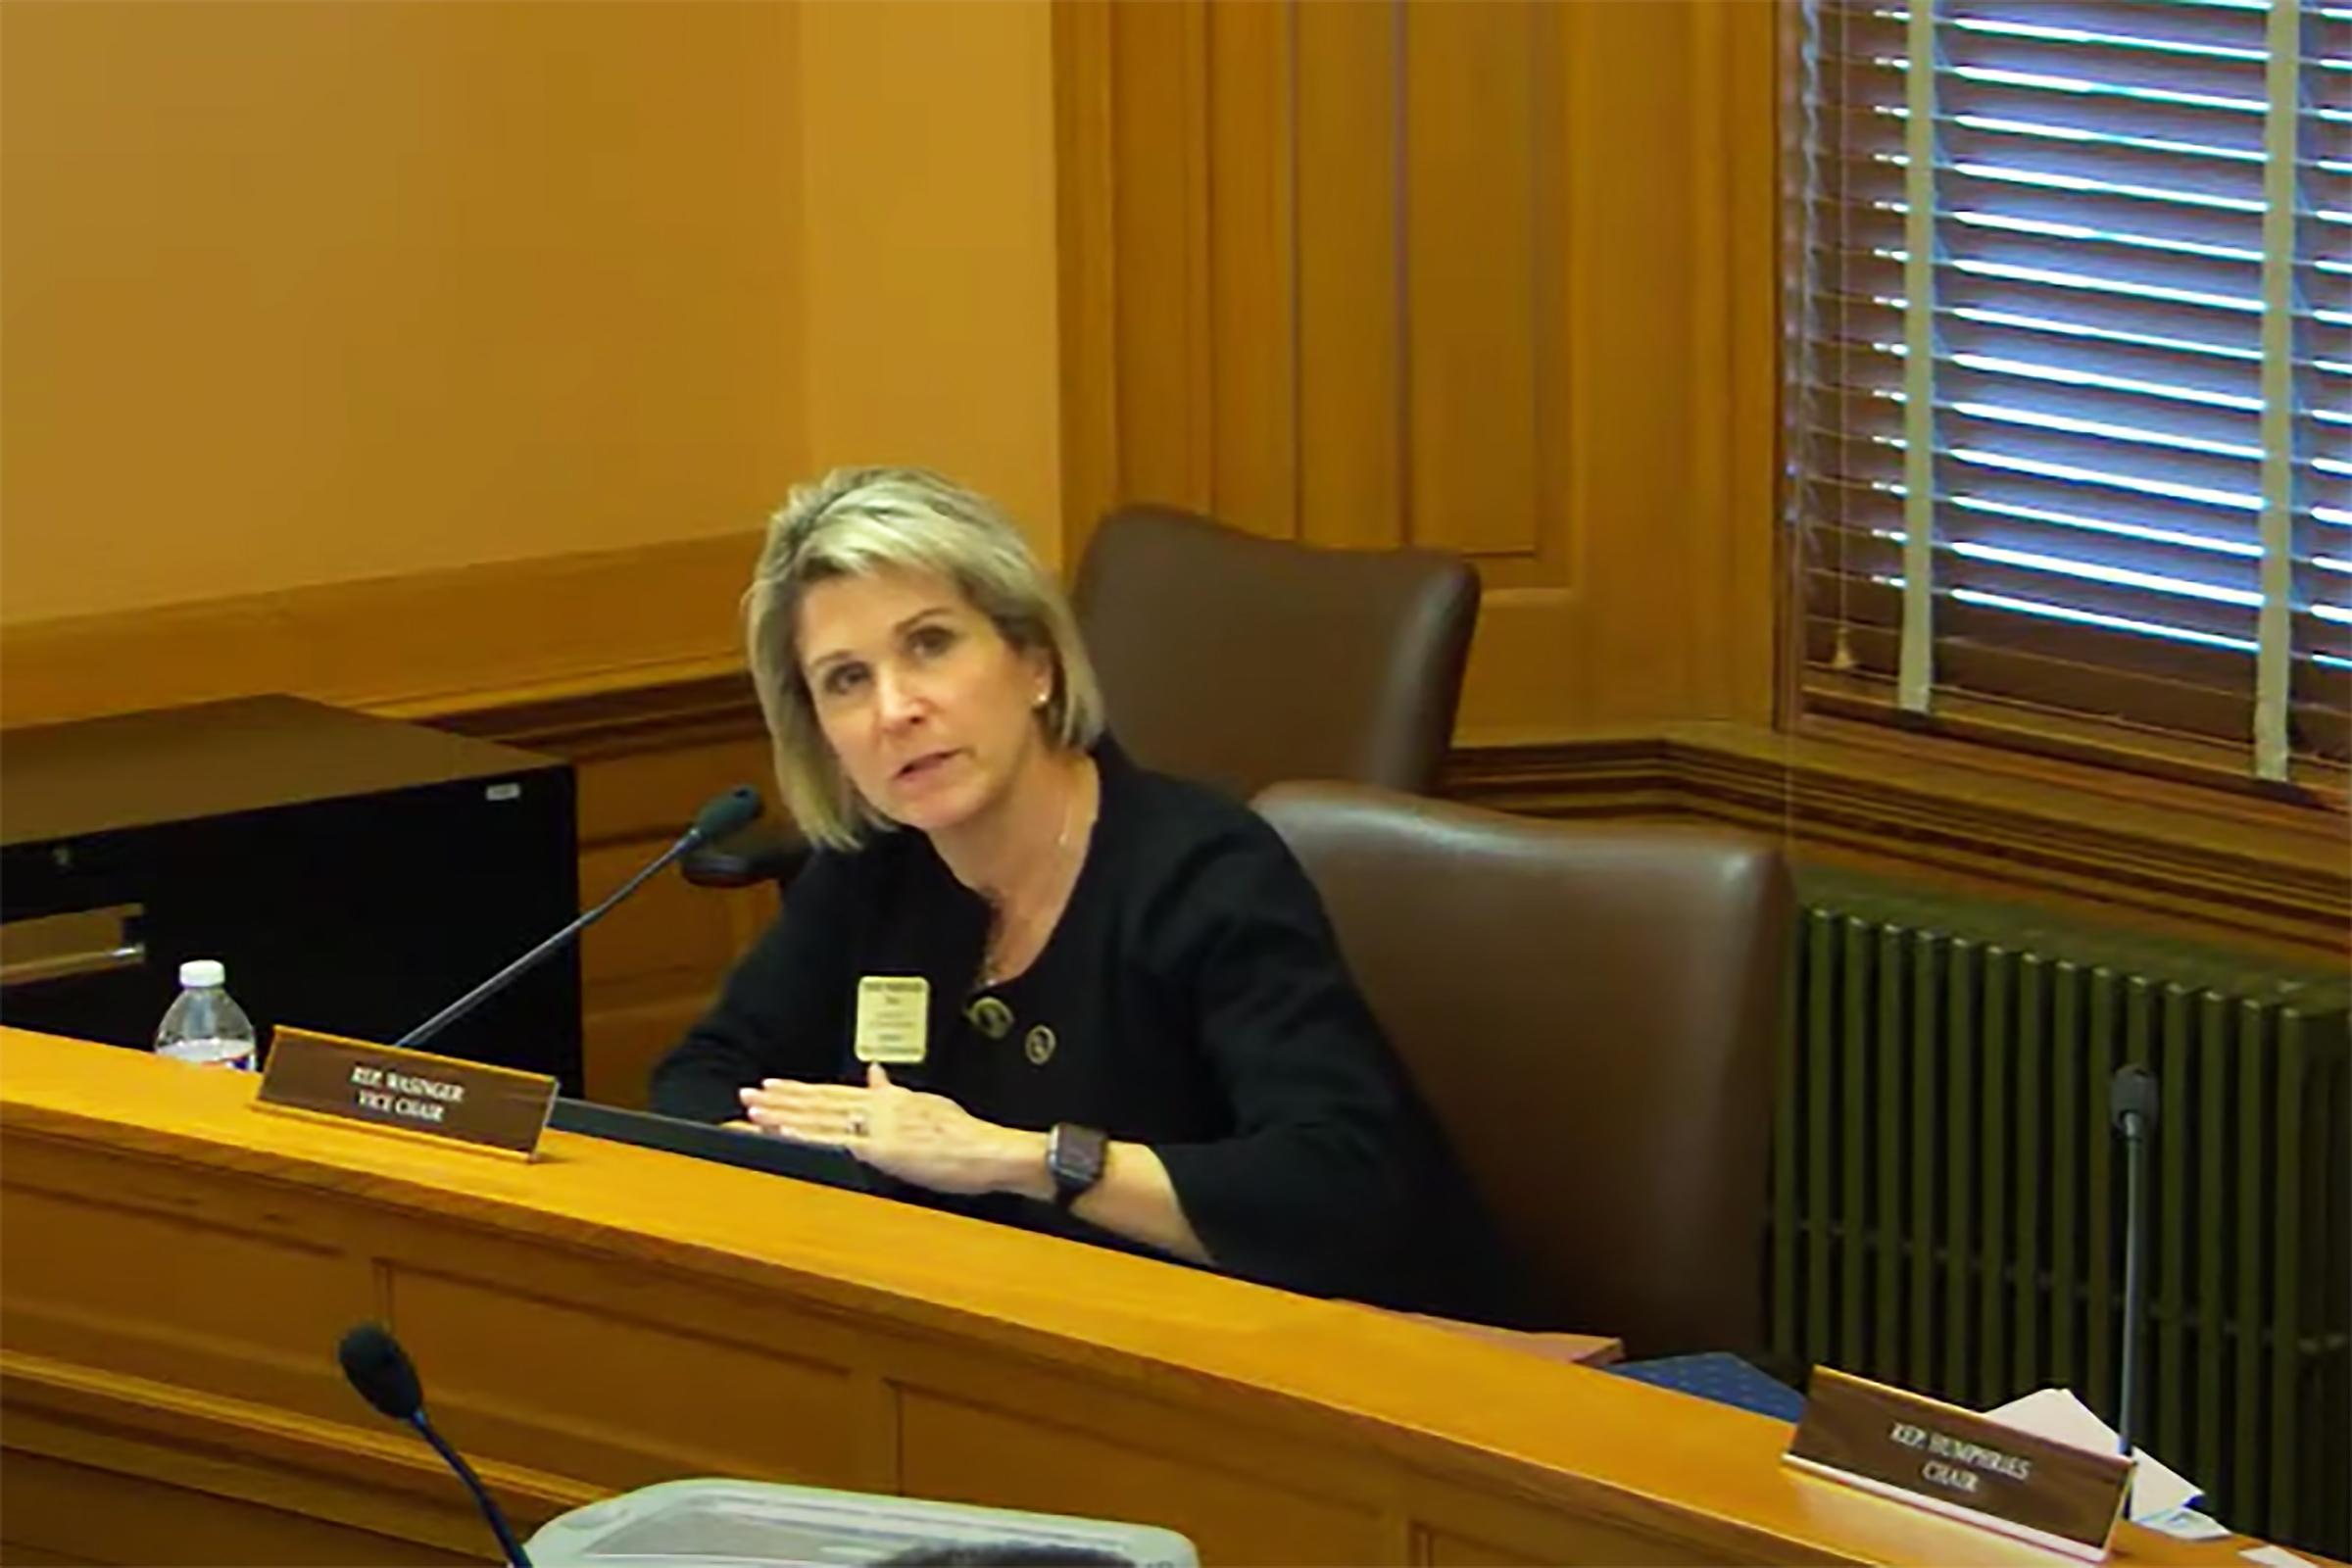 GOP Rep. Wasinger derides public universities in Kansas for falling enrollment, degree duplication